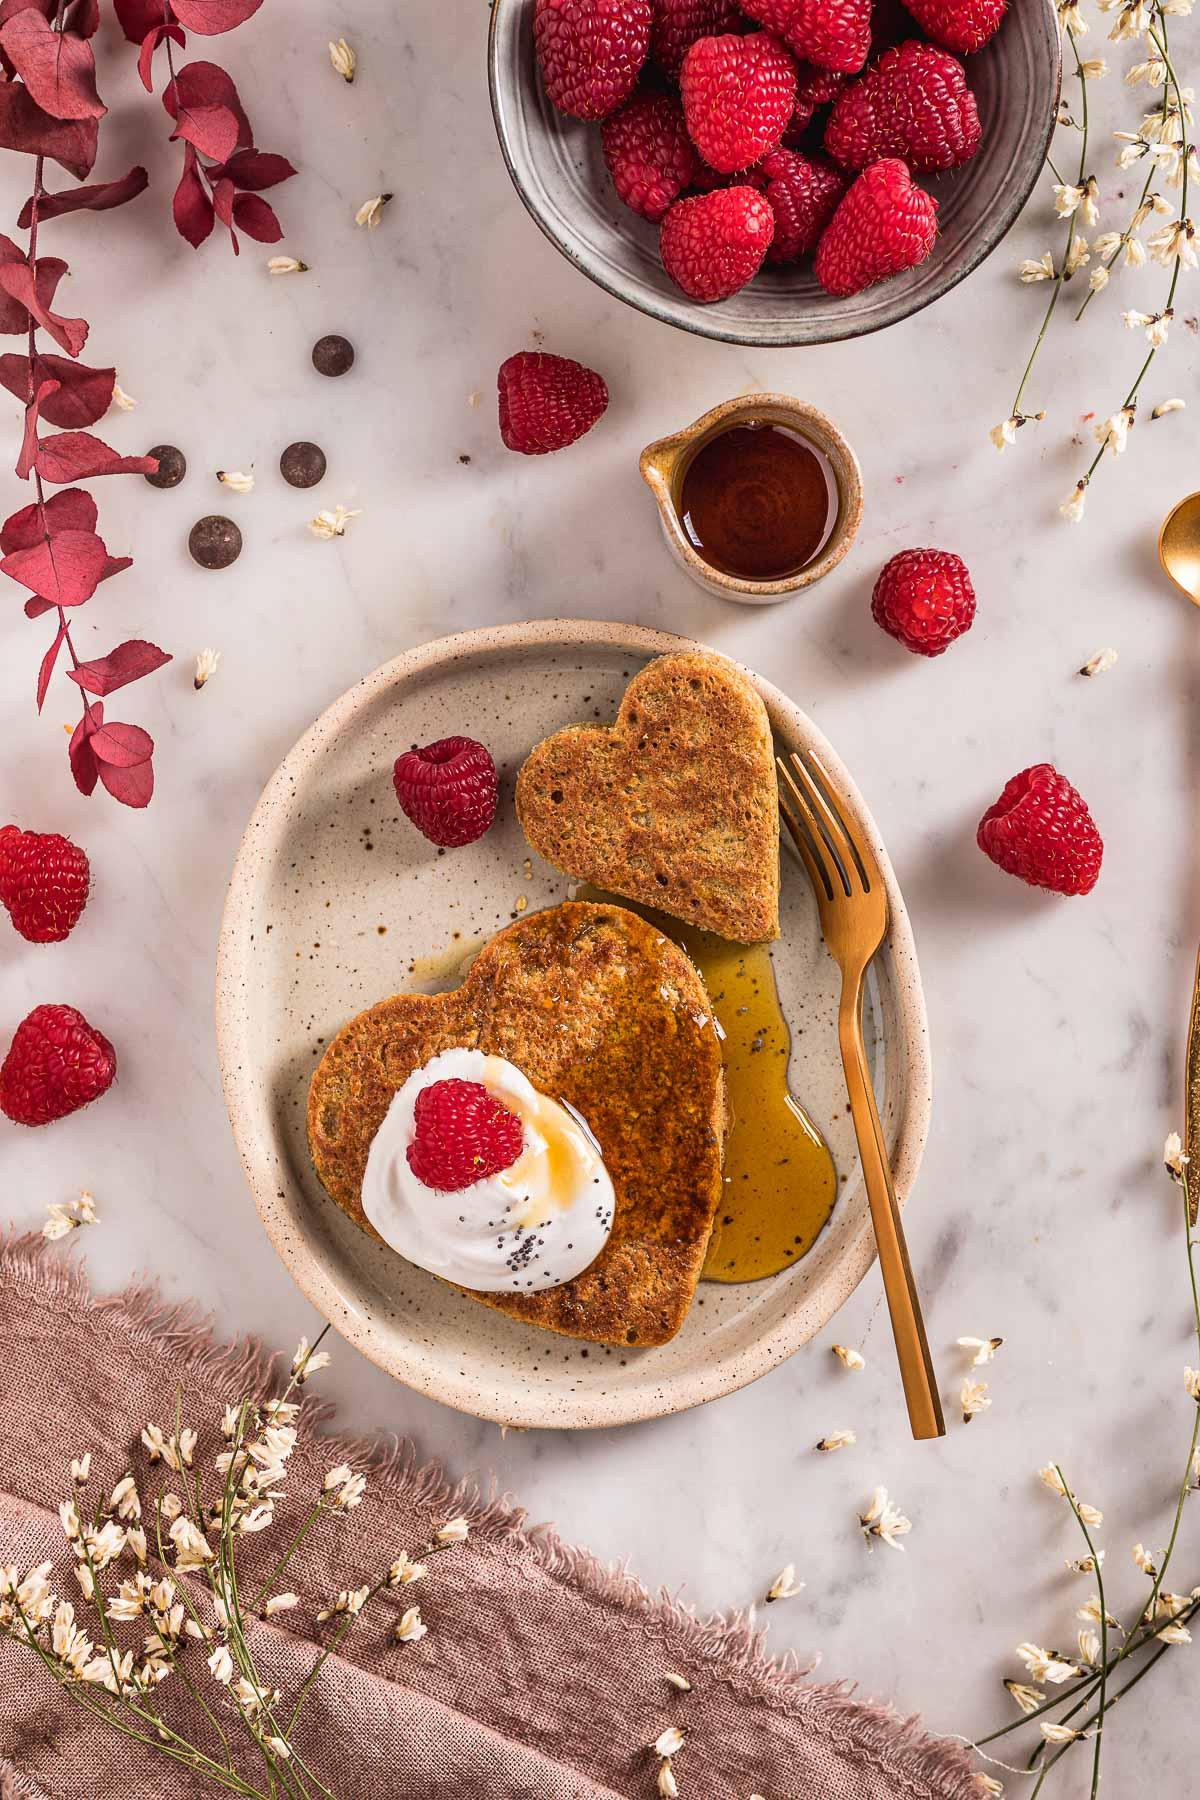 blender gluten-free vegan oat pancakes simple valentine's day pancakes nut-free recipe ricetta pancakes senza glutine senza uova all'avena e cioccolato facili light Pancakes di San Valentino